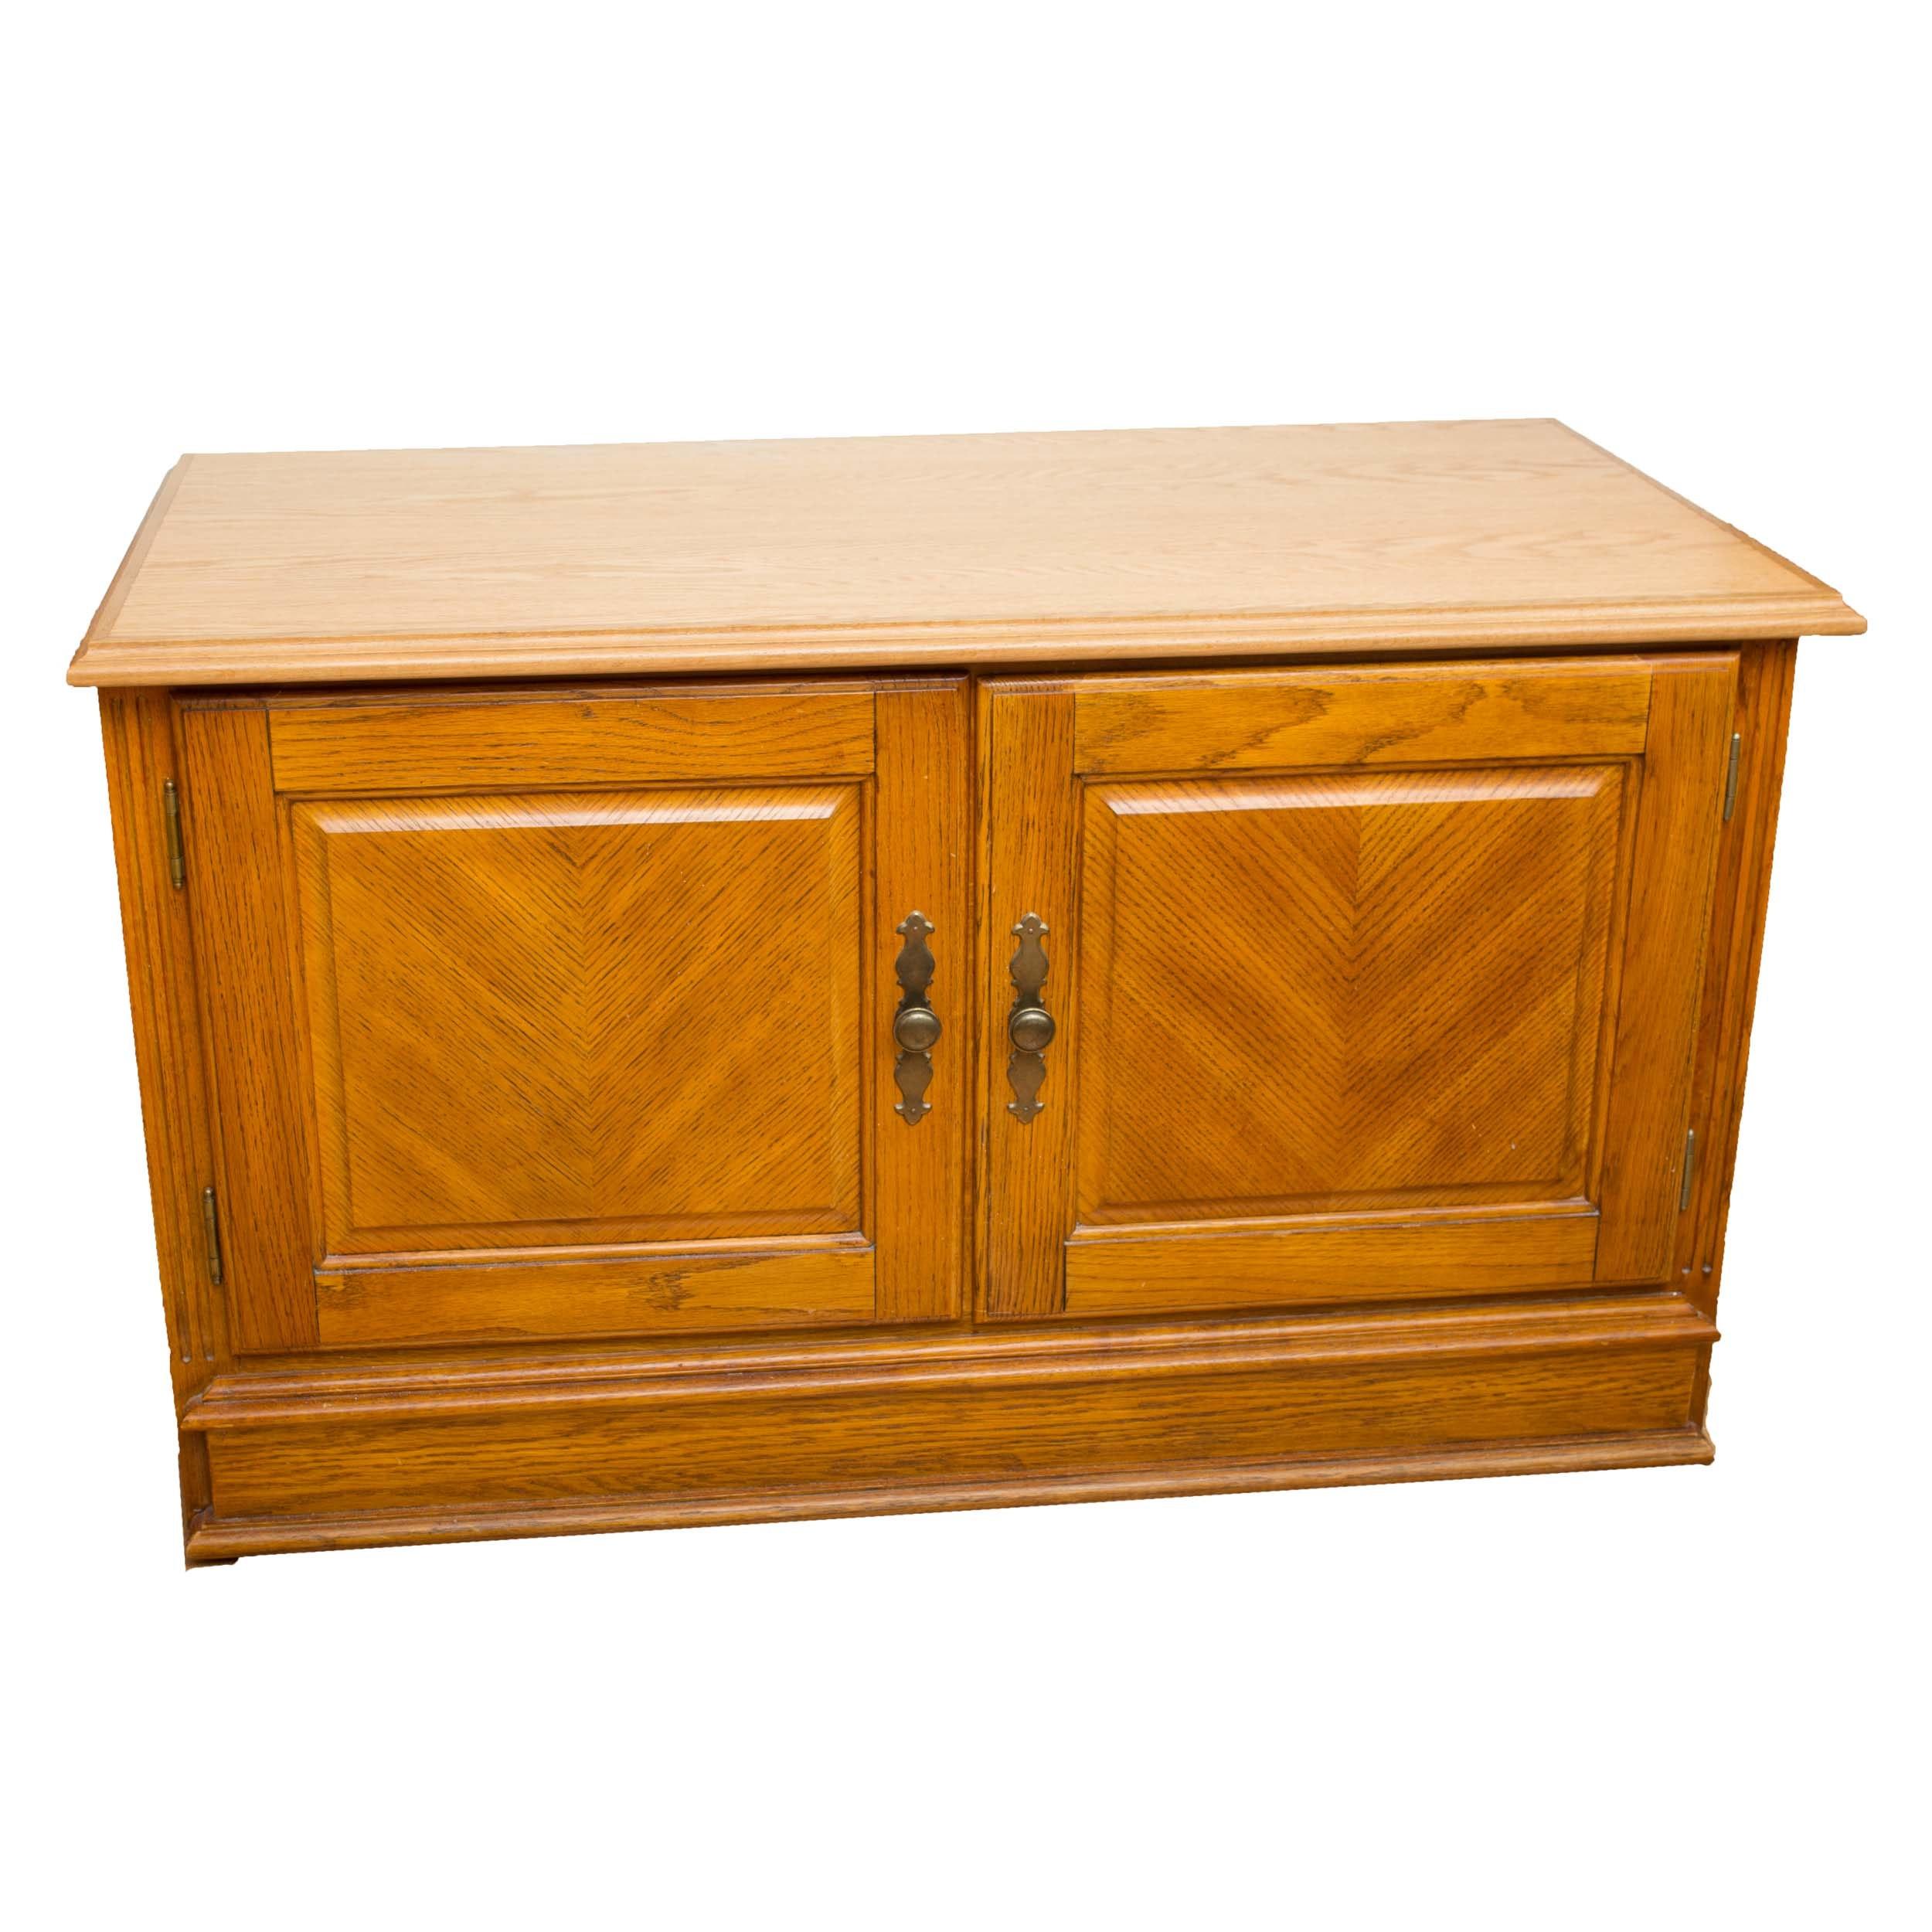 Oak Cabinet with Paneled Doors